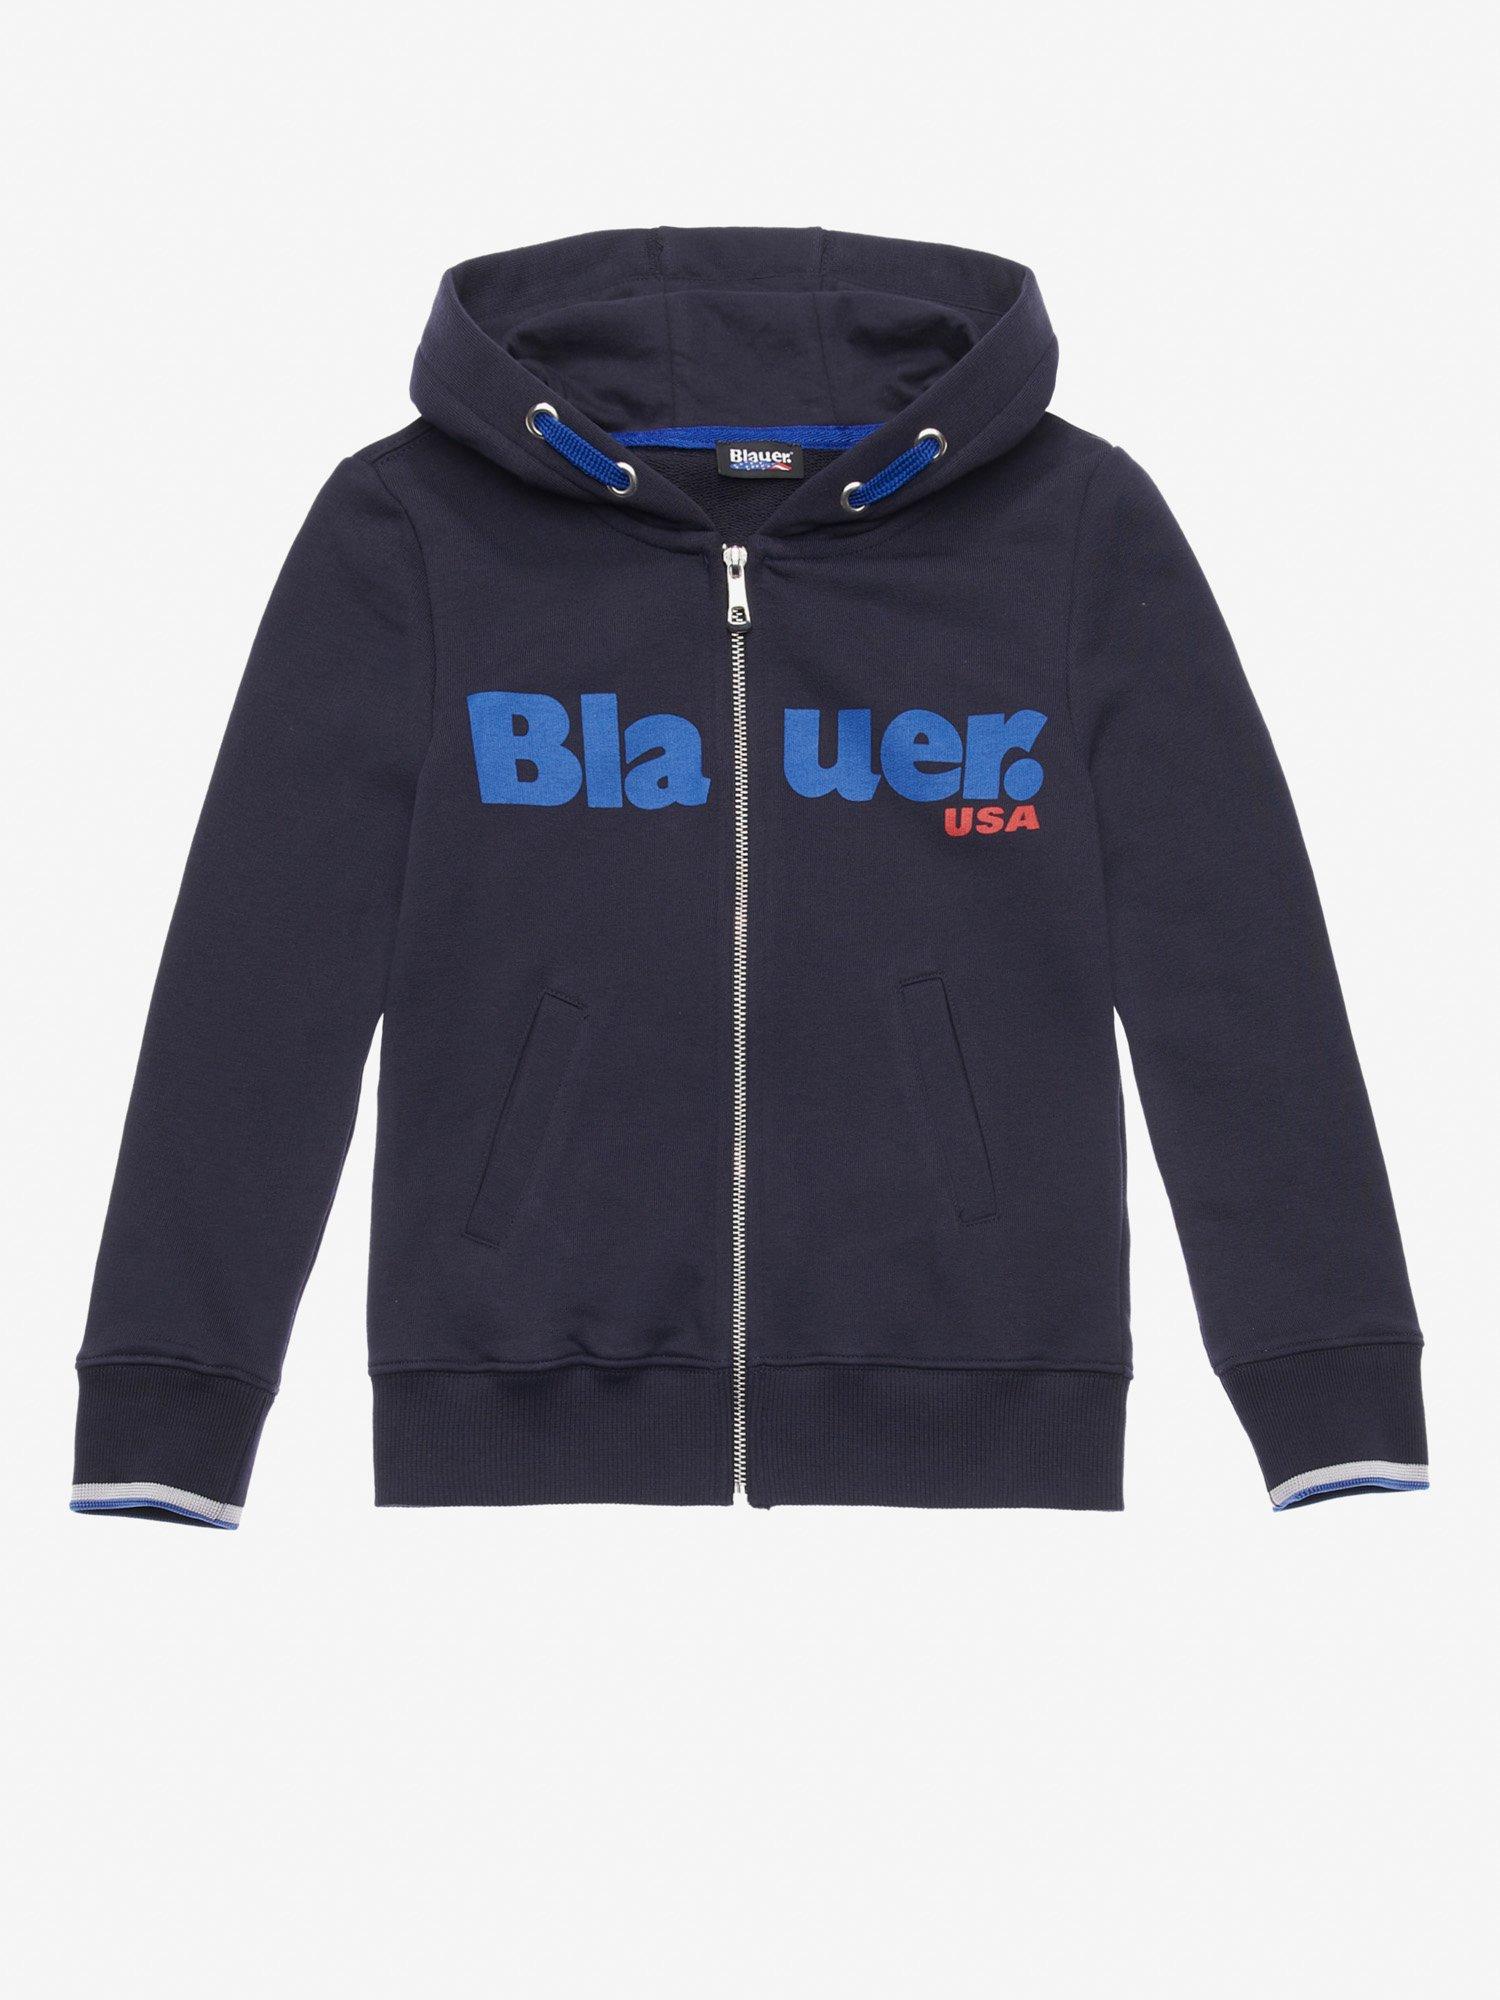 Blauer - FELPA JUNIOR APERTA CON CAPPUCCIO - Blu - Blauer